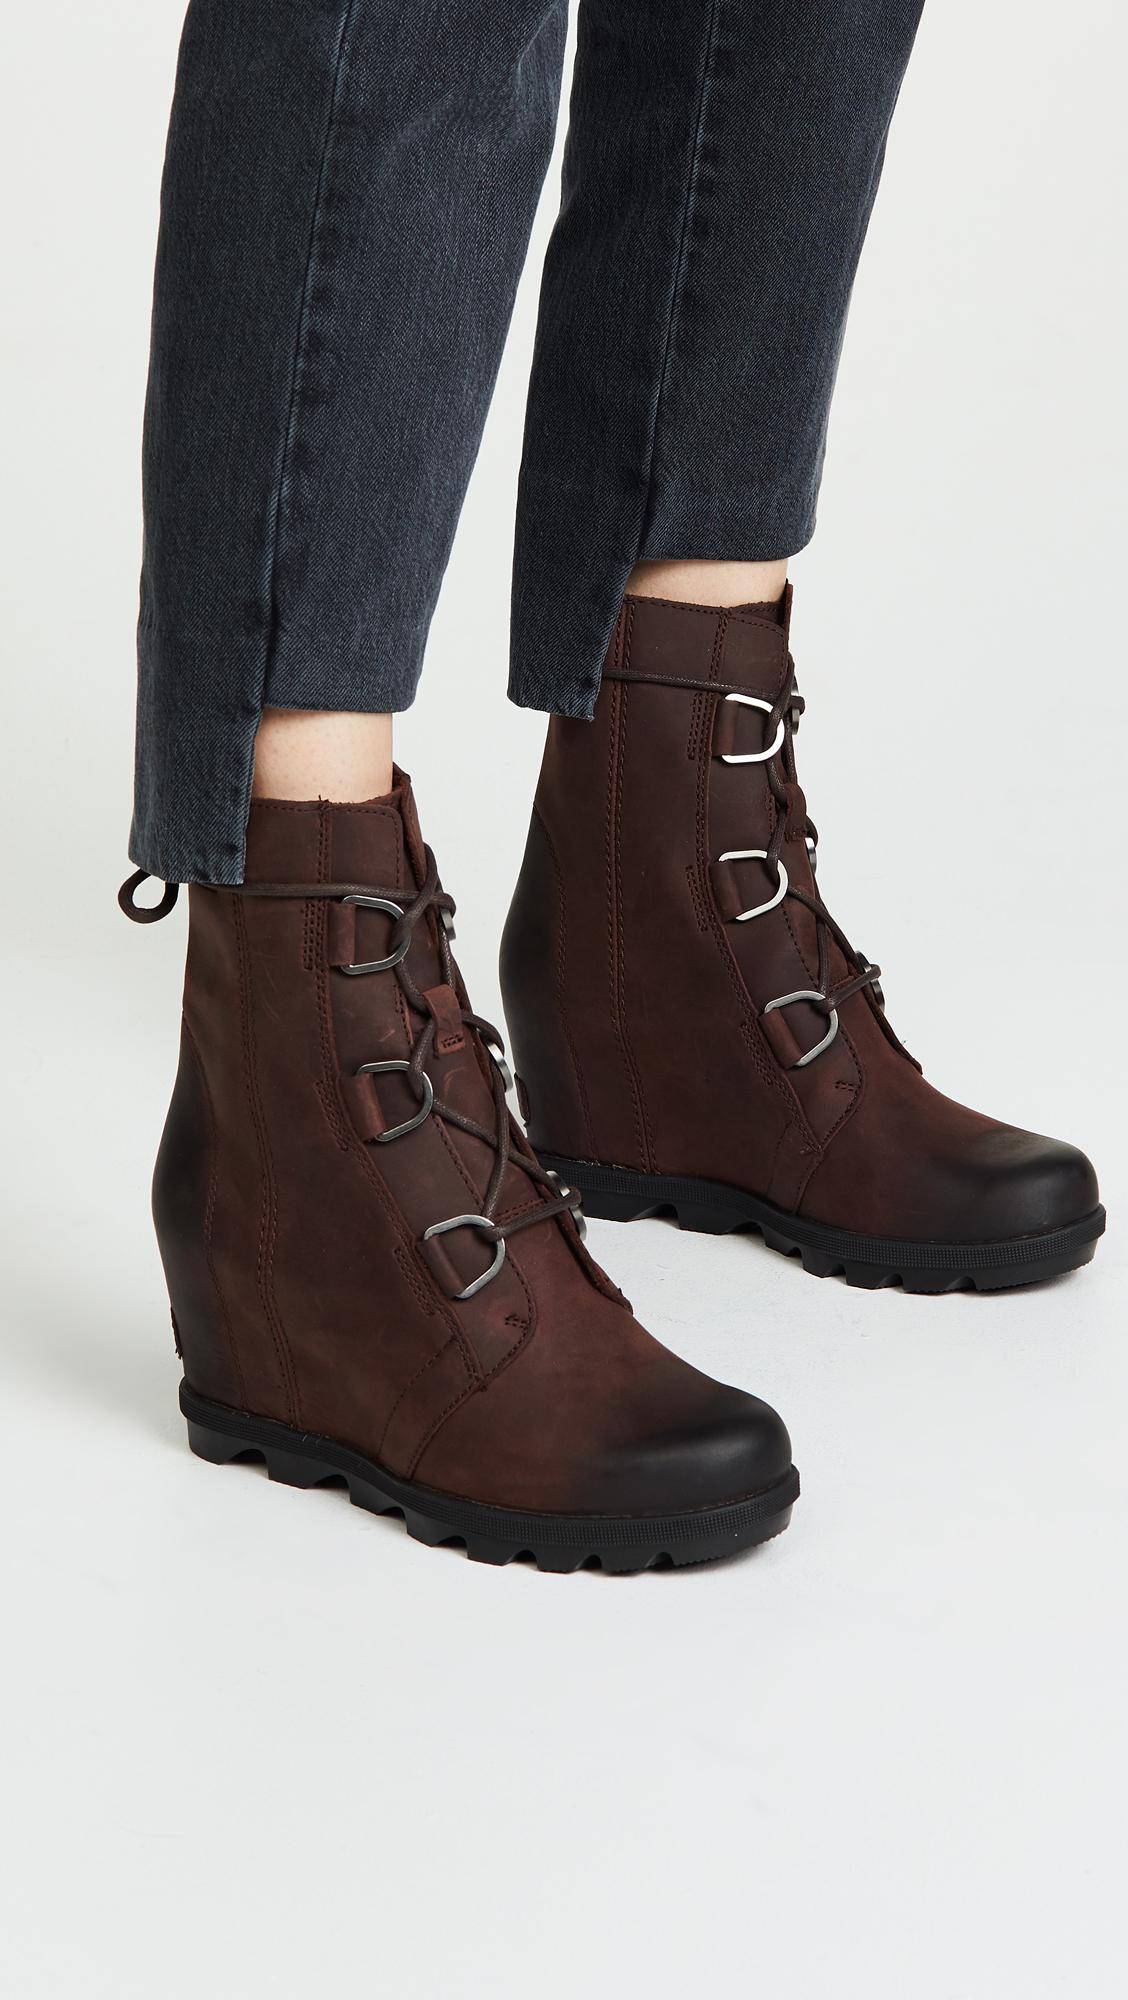 89f636ae6ec Sorel - Brown Joan Of Arctic Wedge Ii Boots - Lyst. View fullscreen